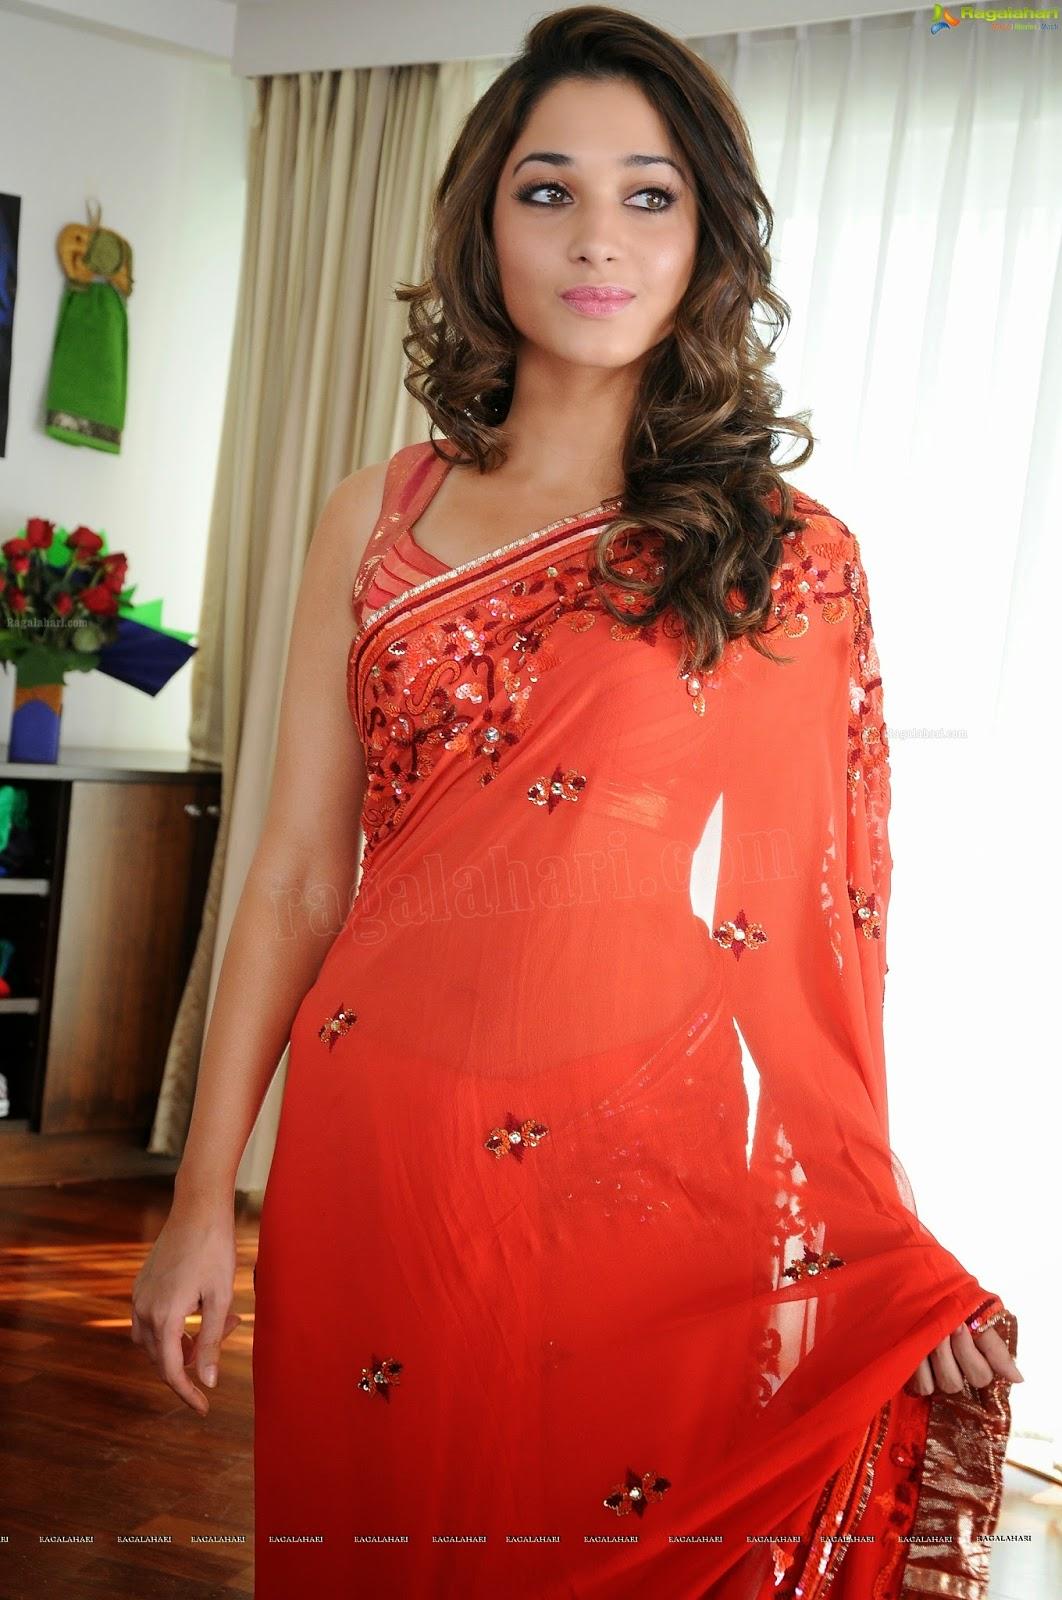 Wearing saree below navel discussion Croft